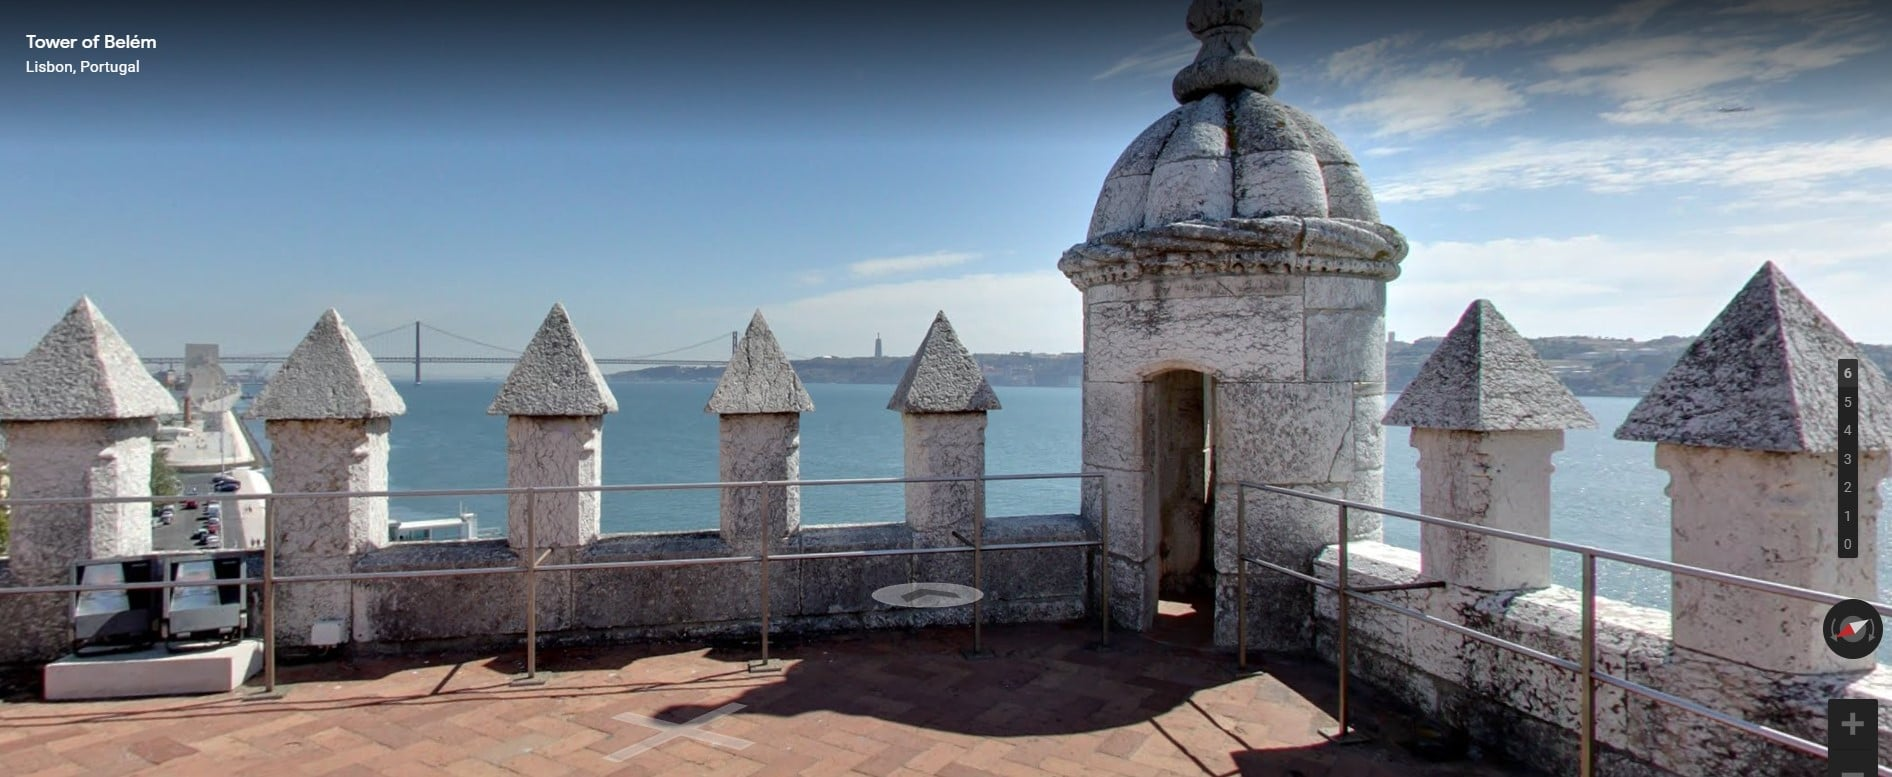 museus nacionais - visita virtual torre de belém